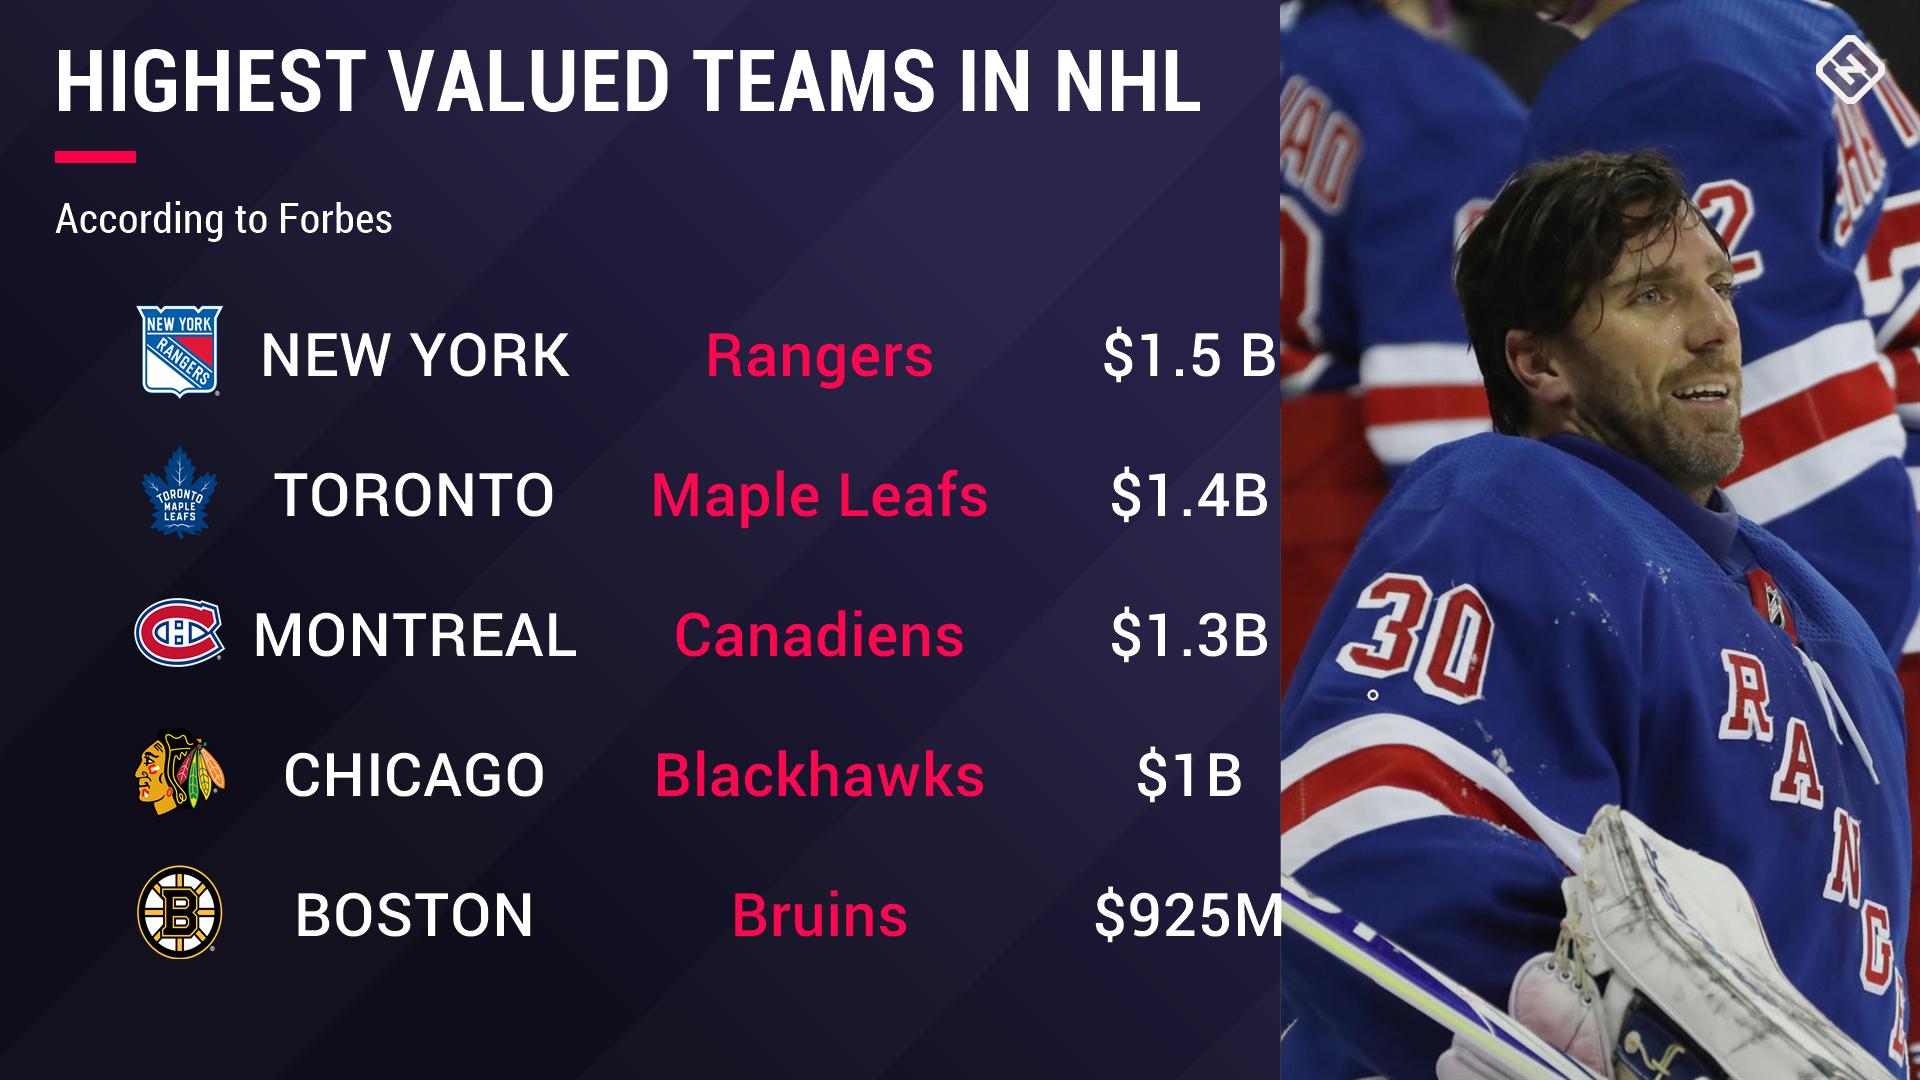 highest-valued-teams-nhl-120518-getty-ftr.jpg